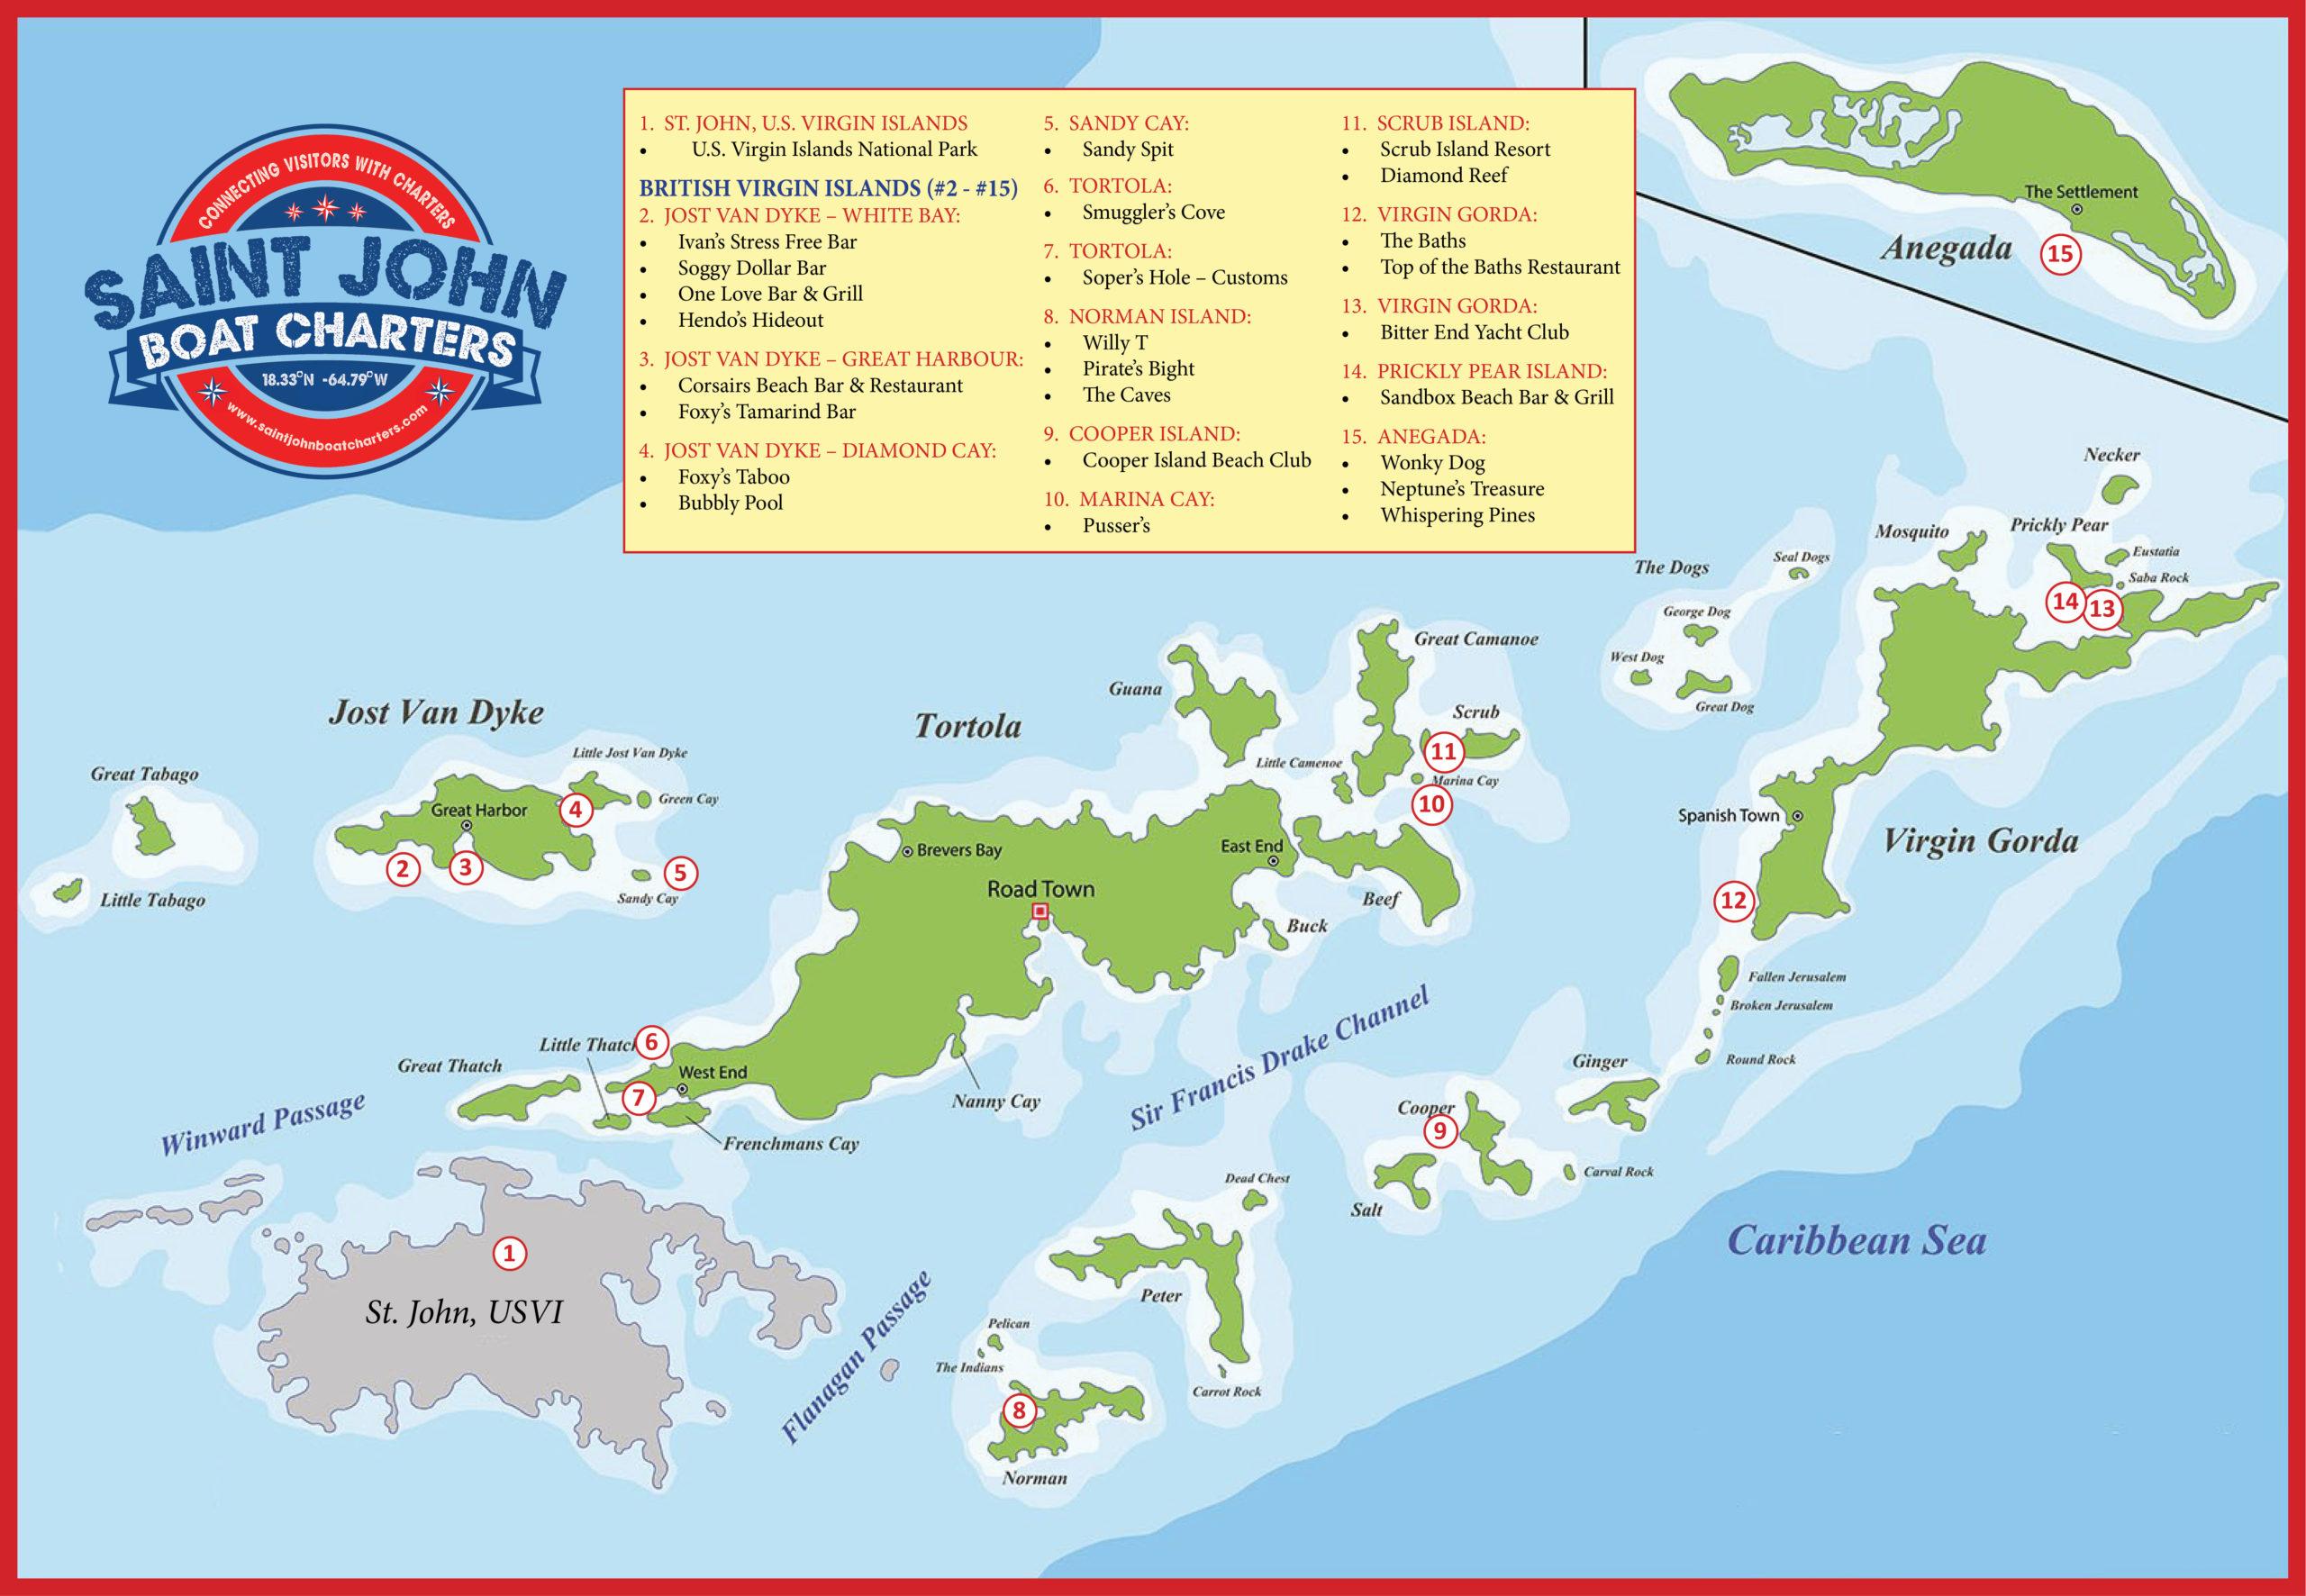 Saint John Boat Charters Destinations